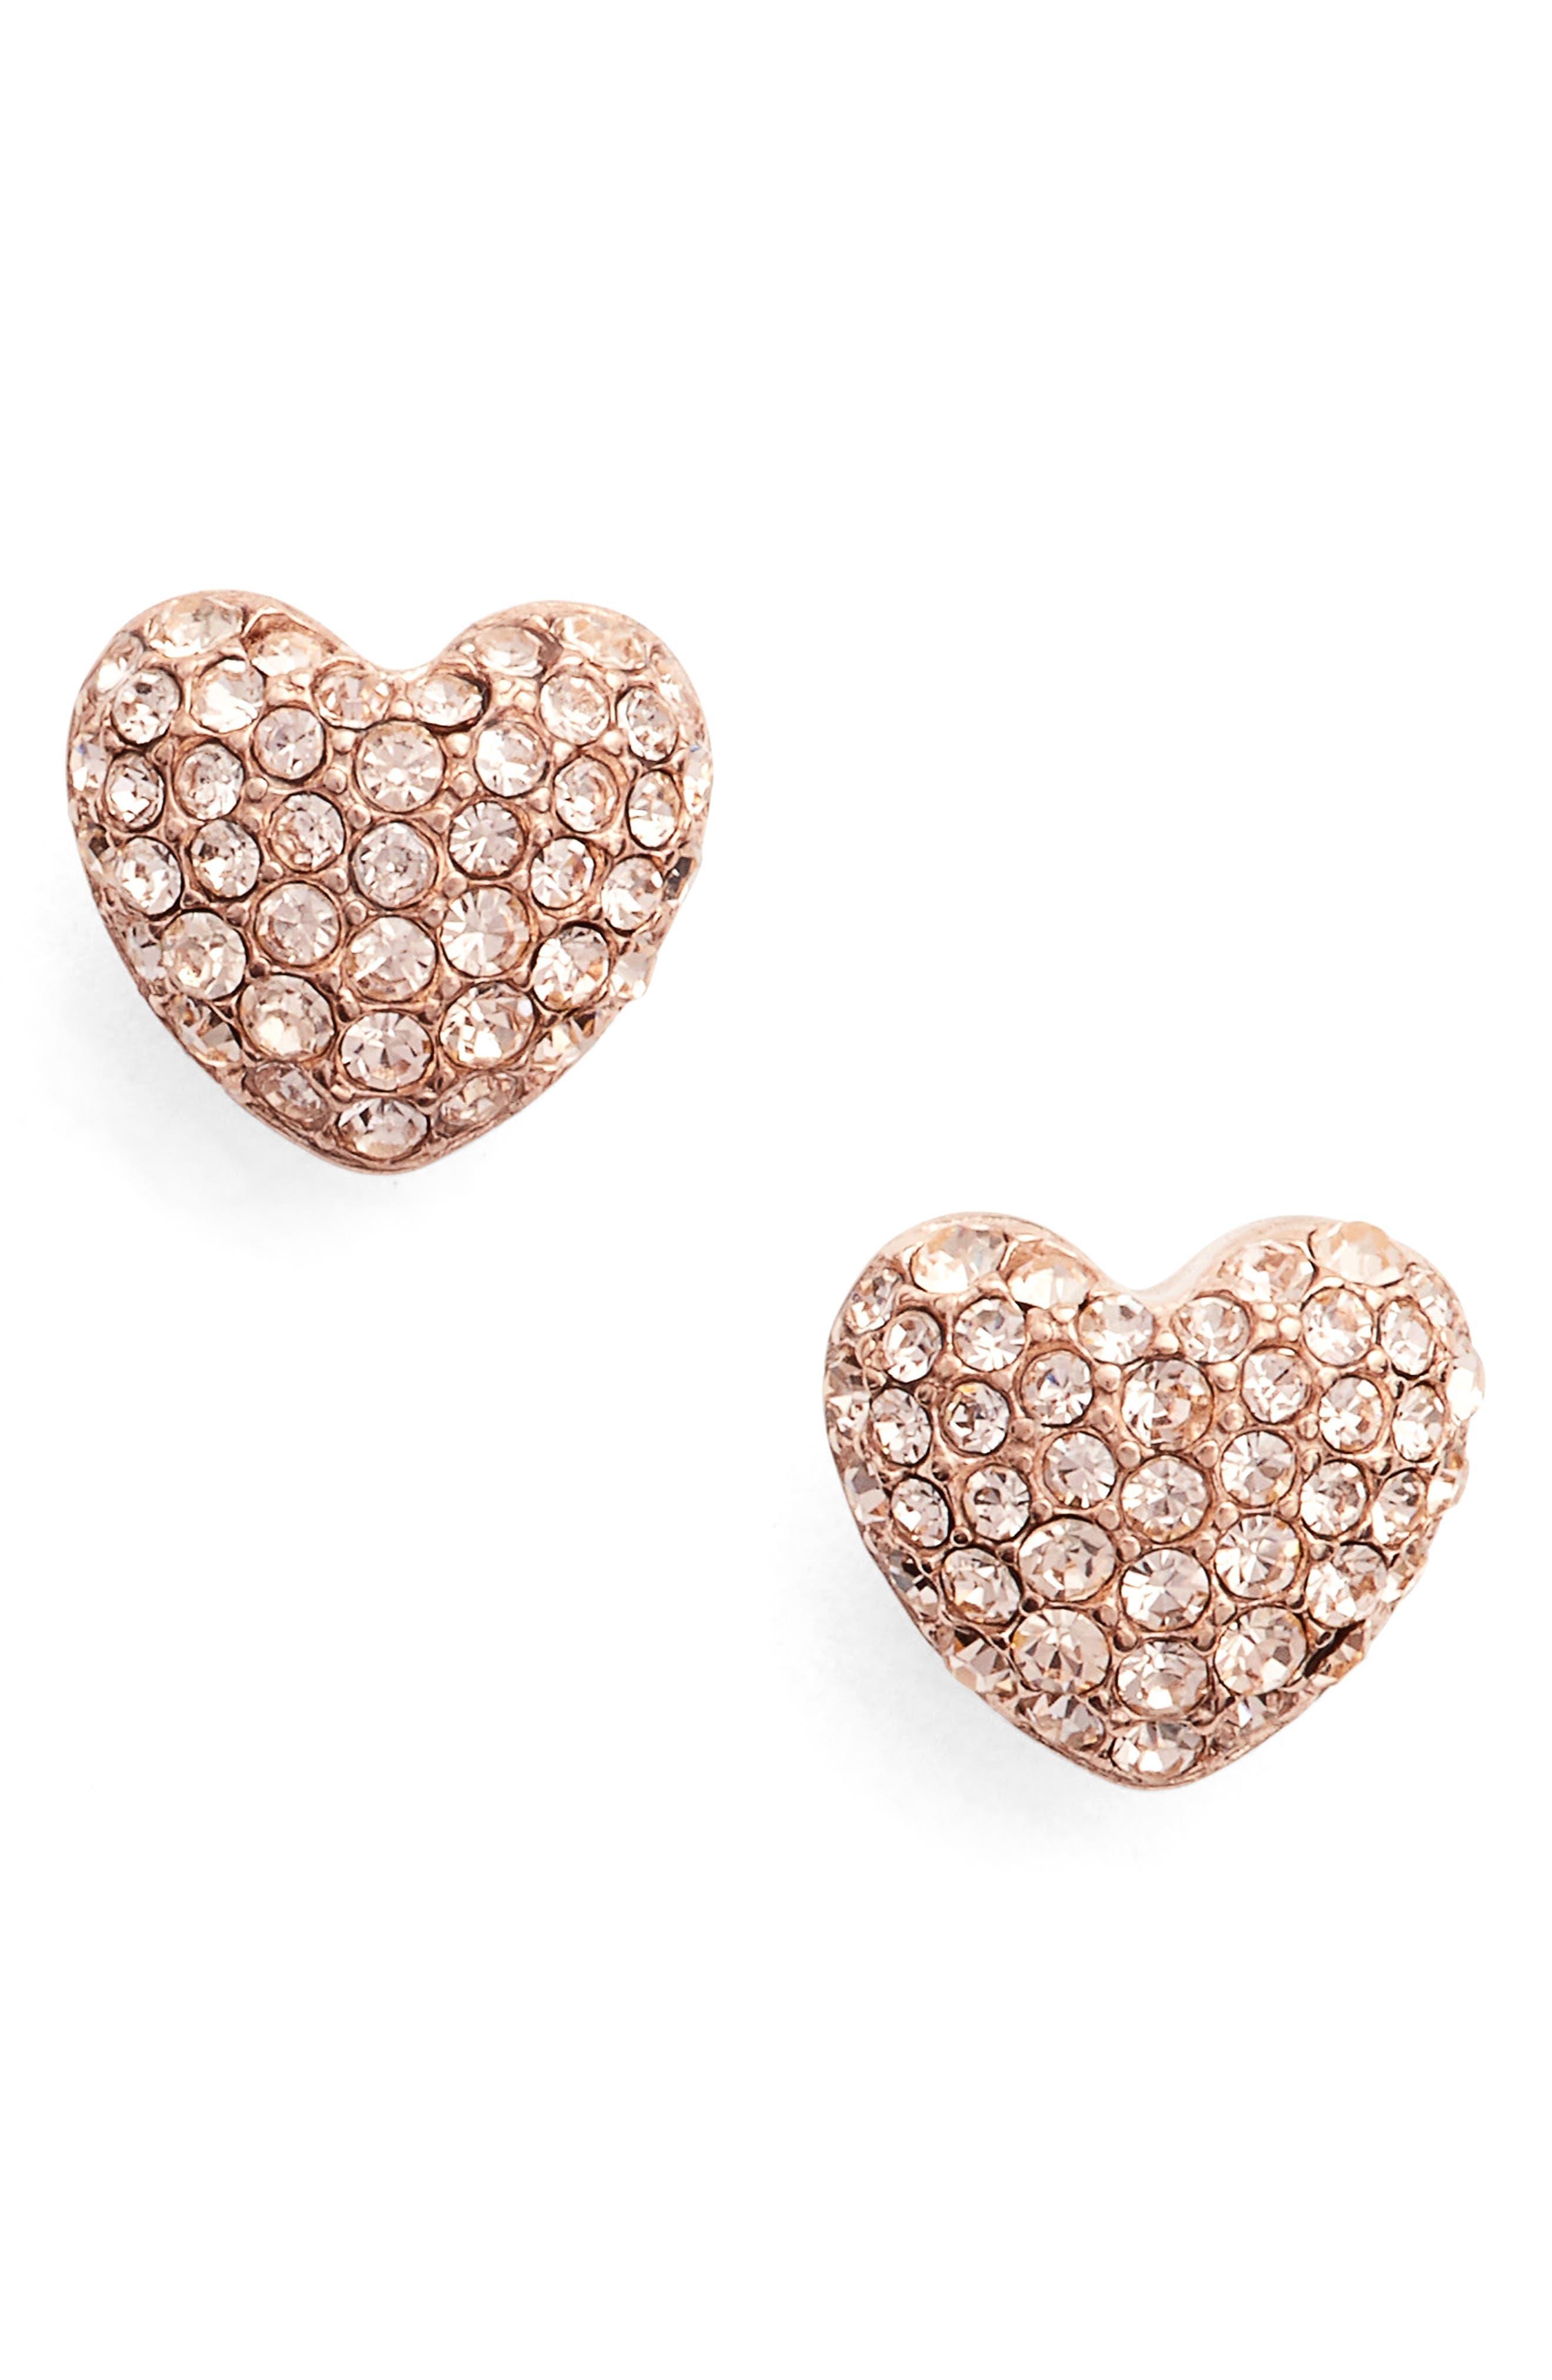 MICHAEL KORS Heart Stud Earrings